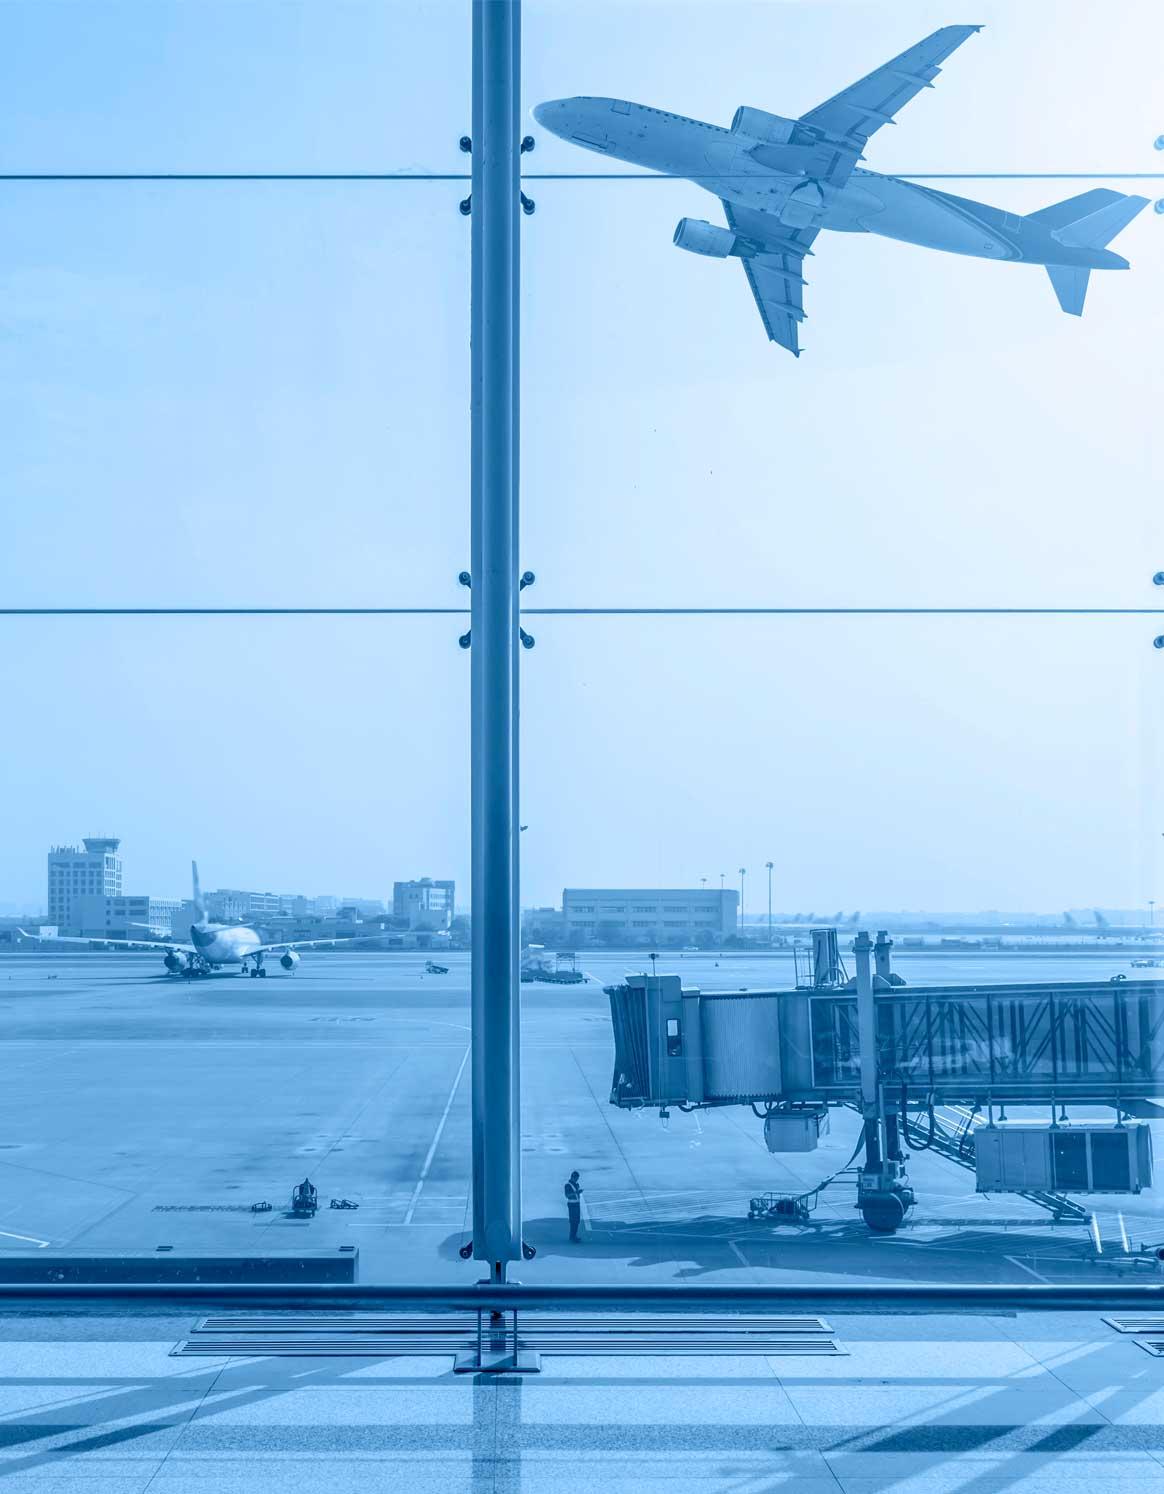 PCR testing for International Travels